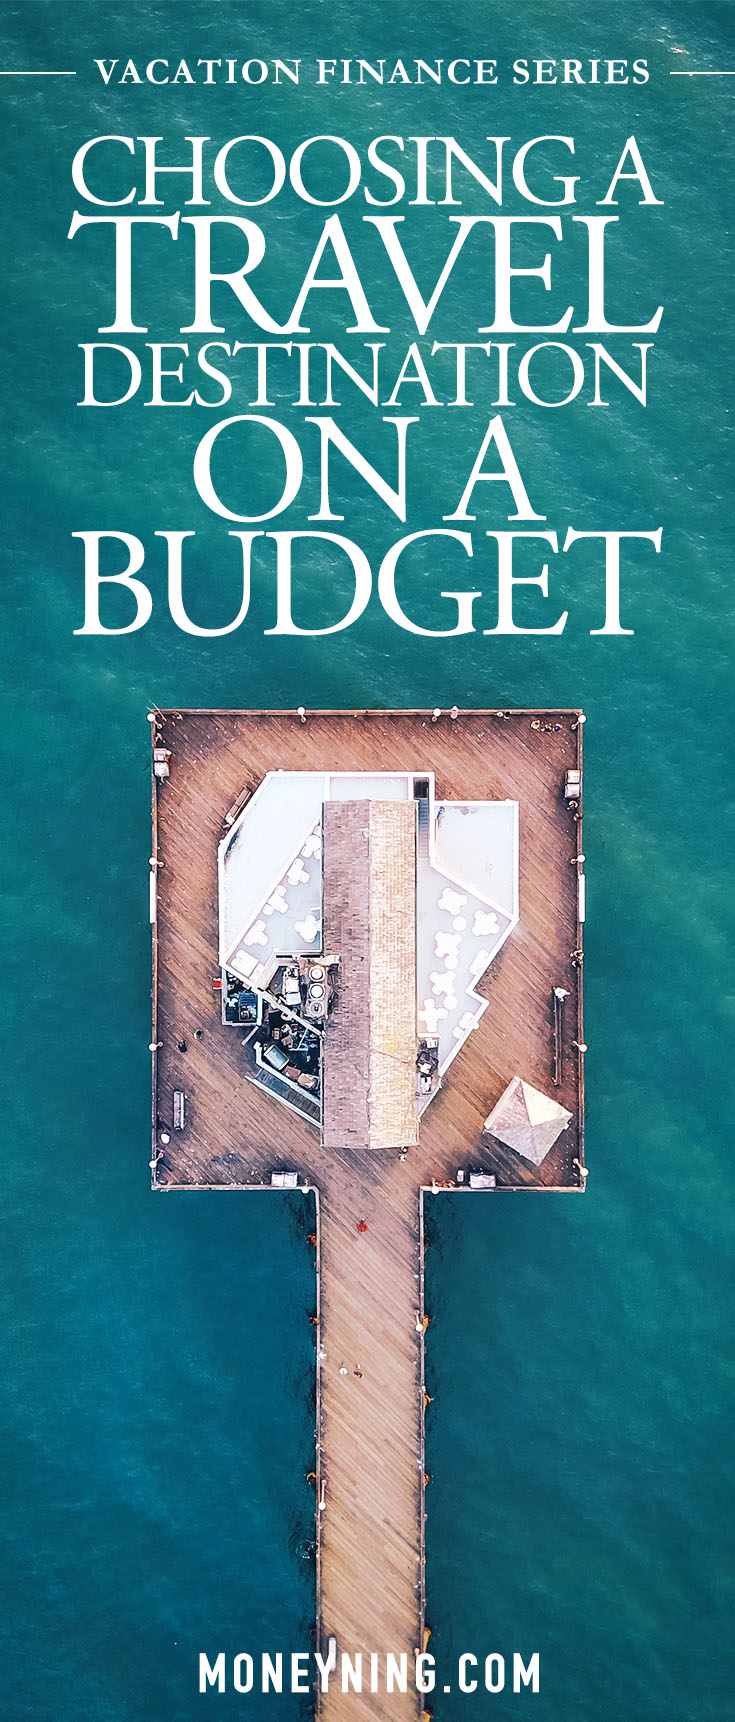 travel destination on a budget